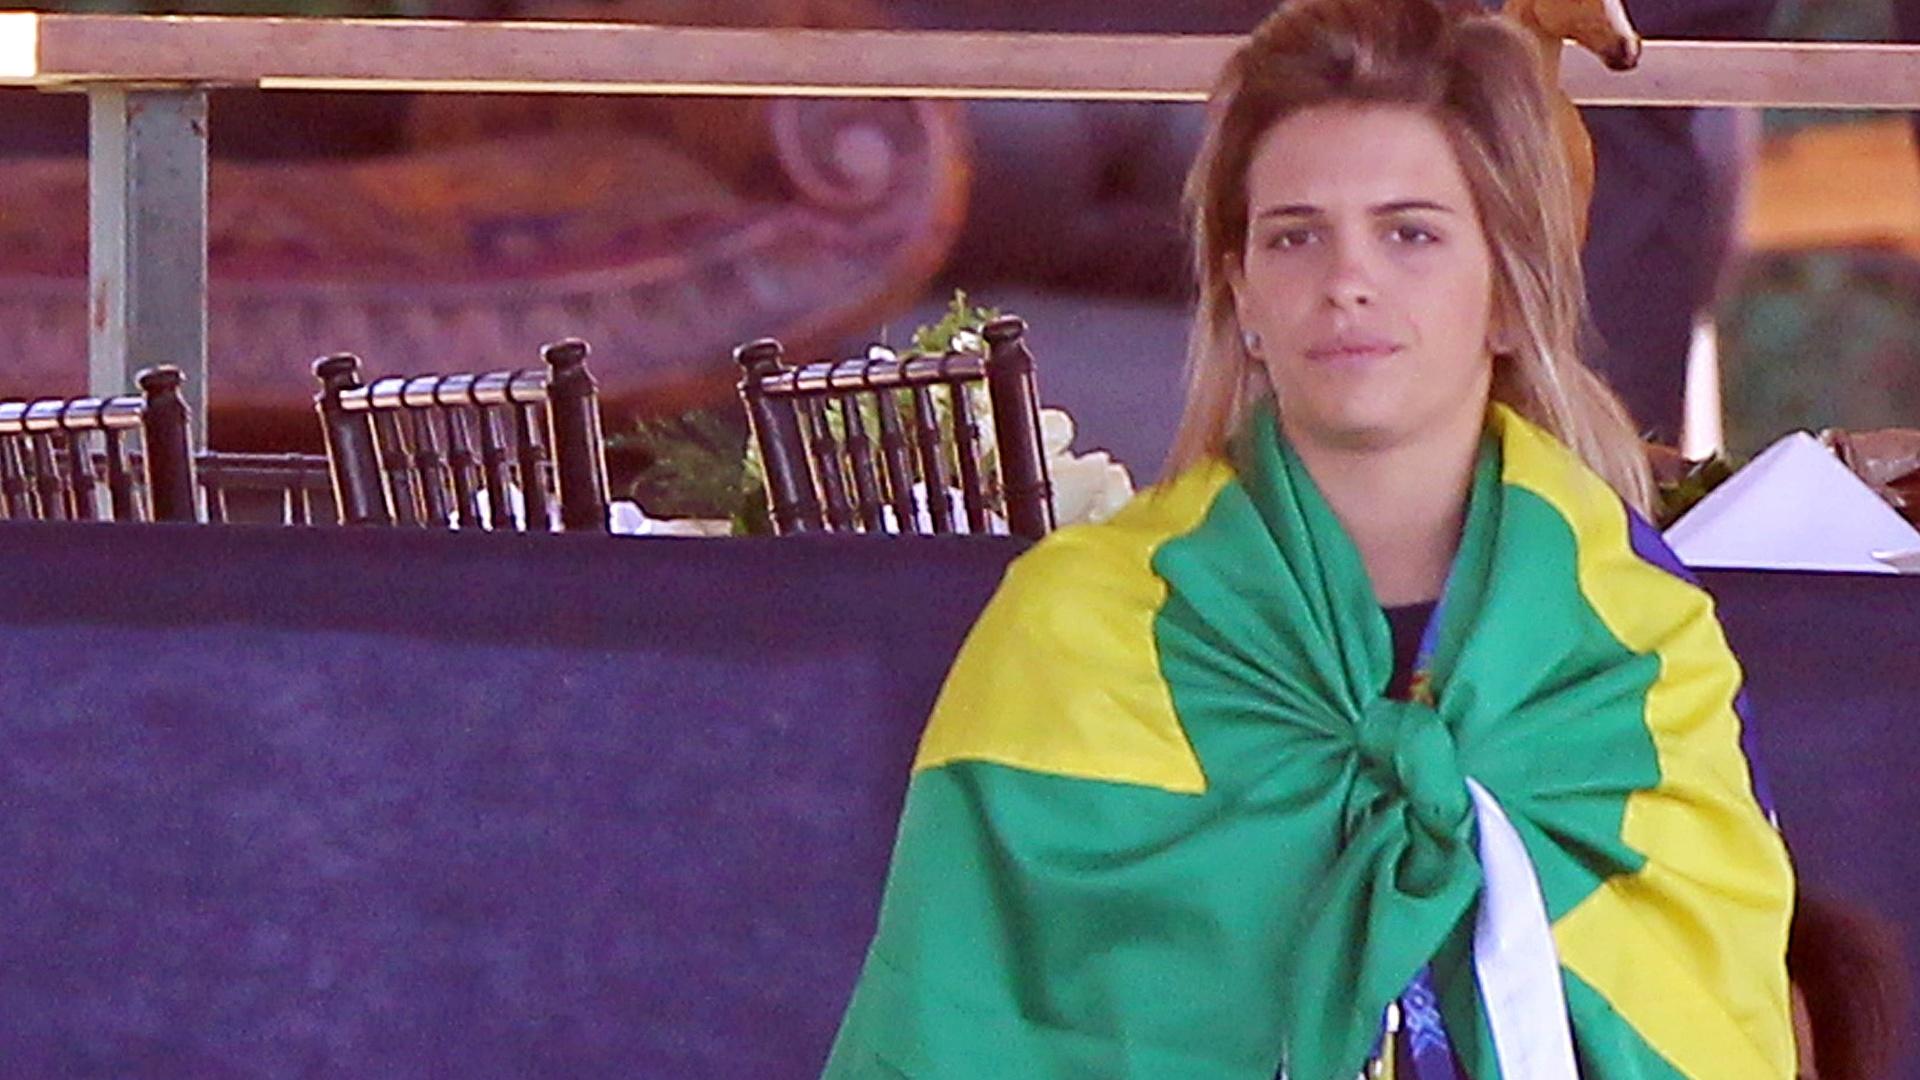 Amazona Luiza Almeida se enrola em bandeira brasileira antes de iniciar a prova de adestramento do hipismo (16/10/2011)